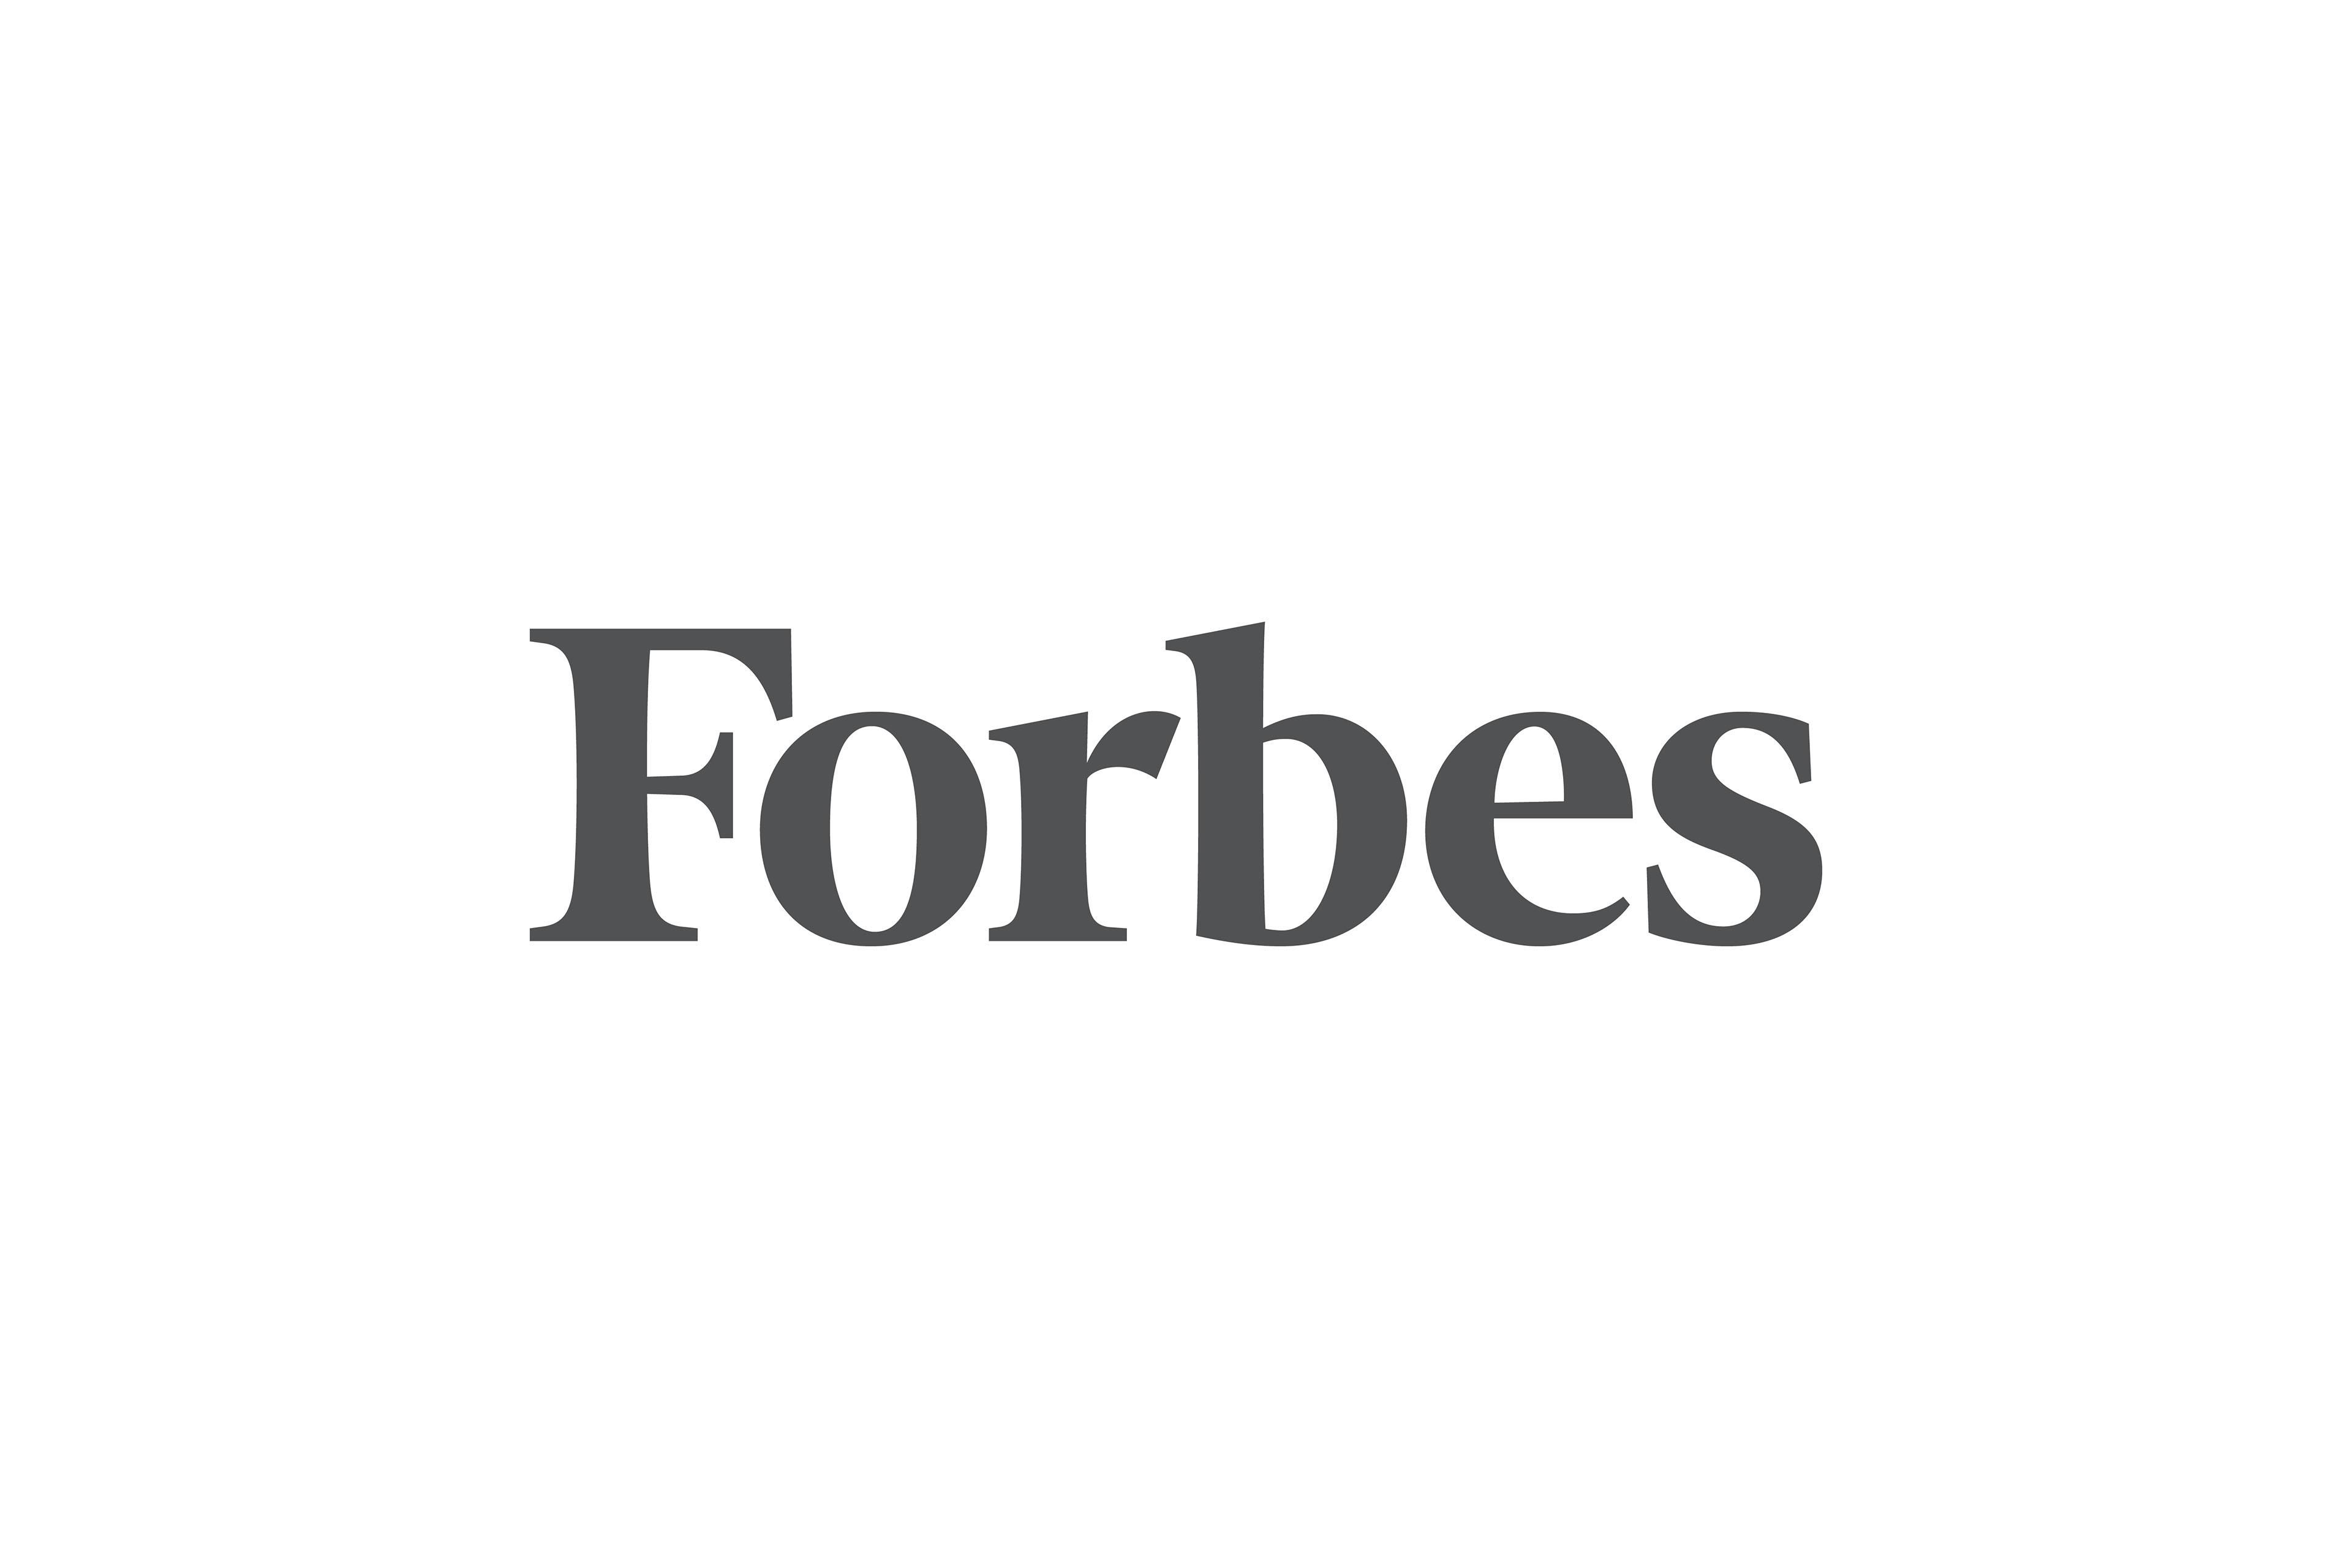 Forbes Grey logo